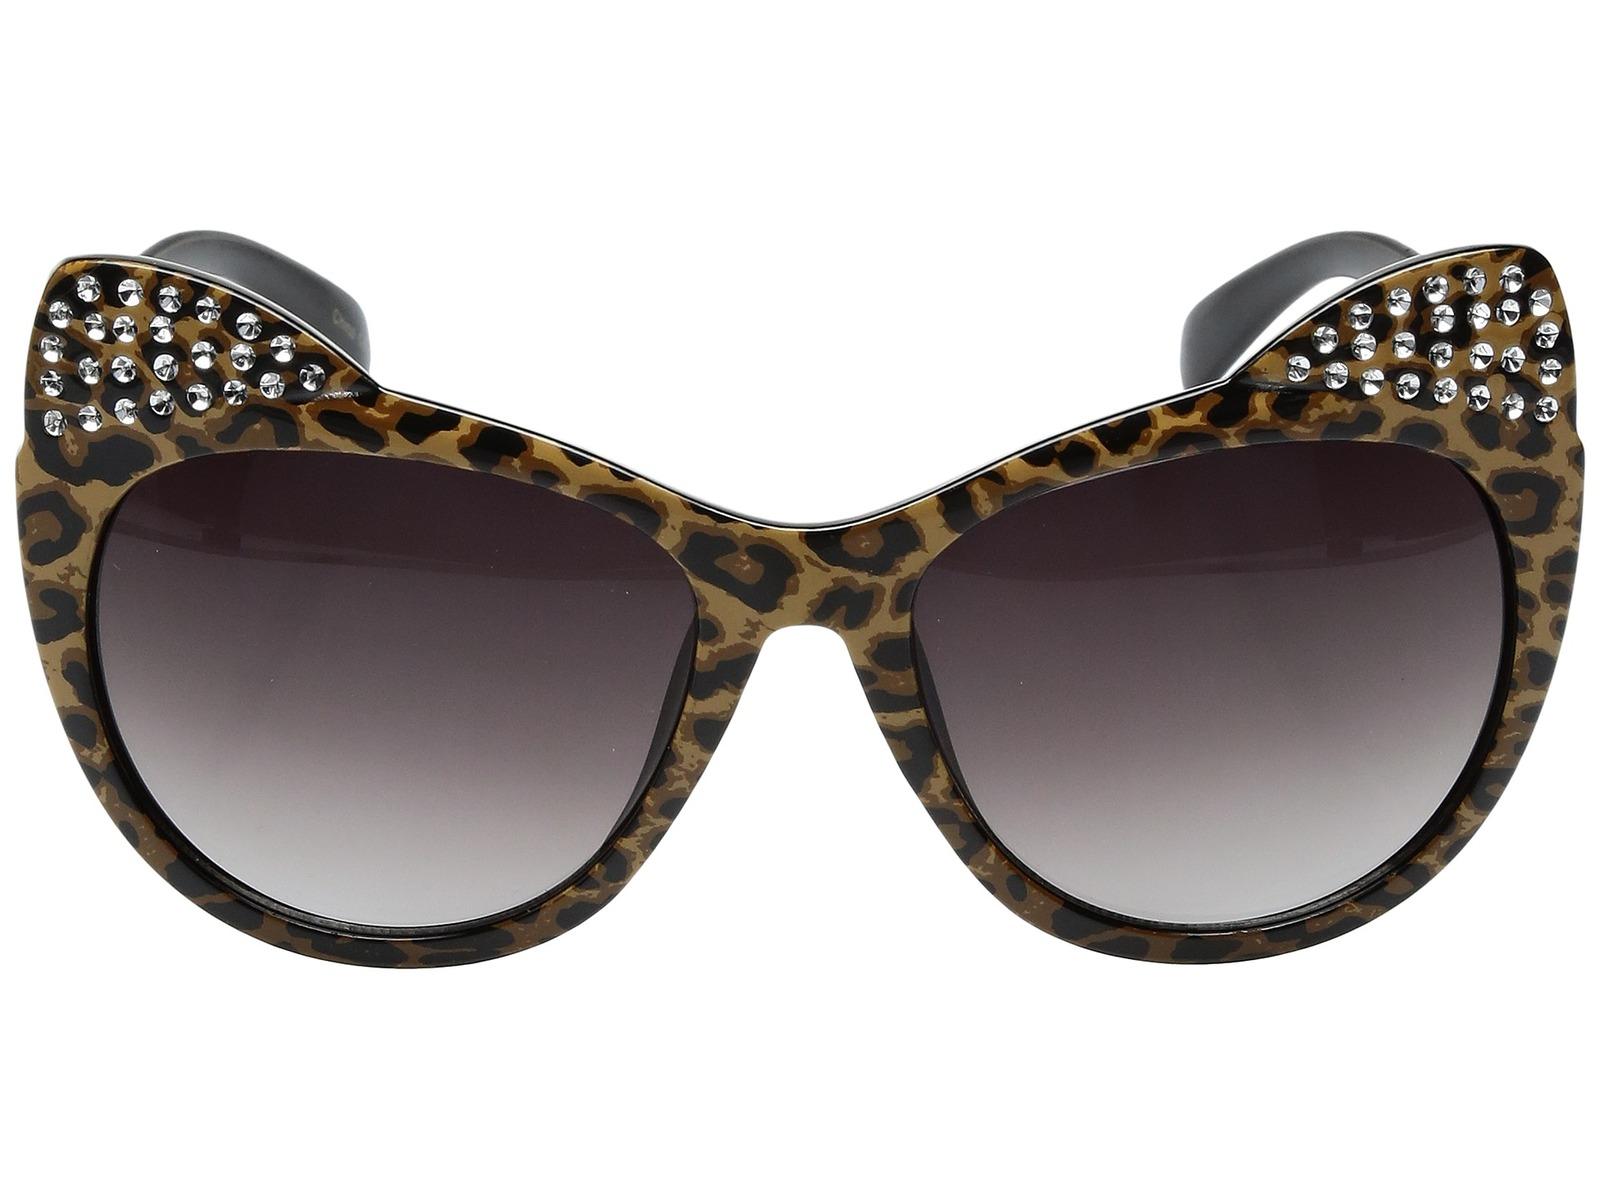 104e843a5033 Betsey Johnsons Kitty Ears Sunglasses and 50 similar items